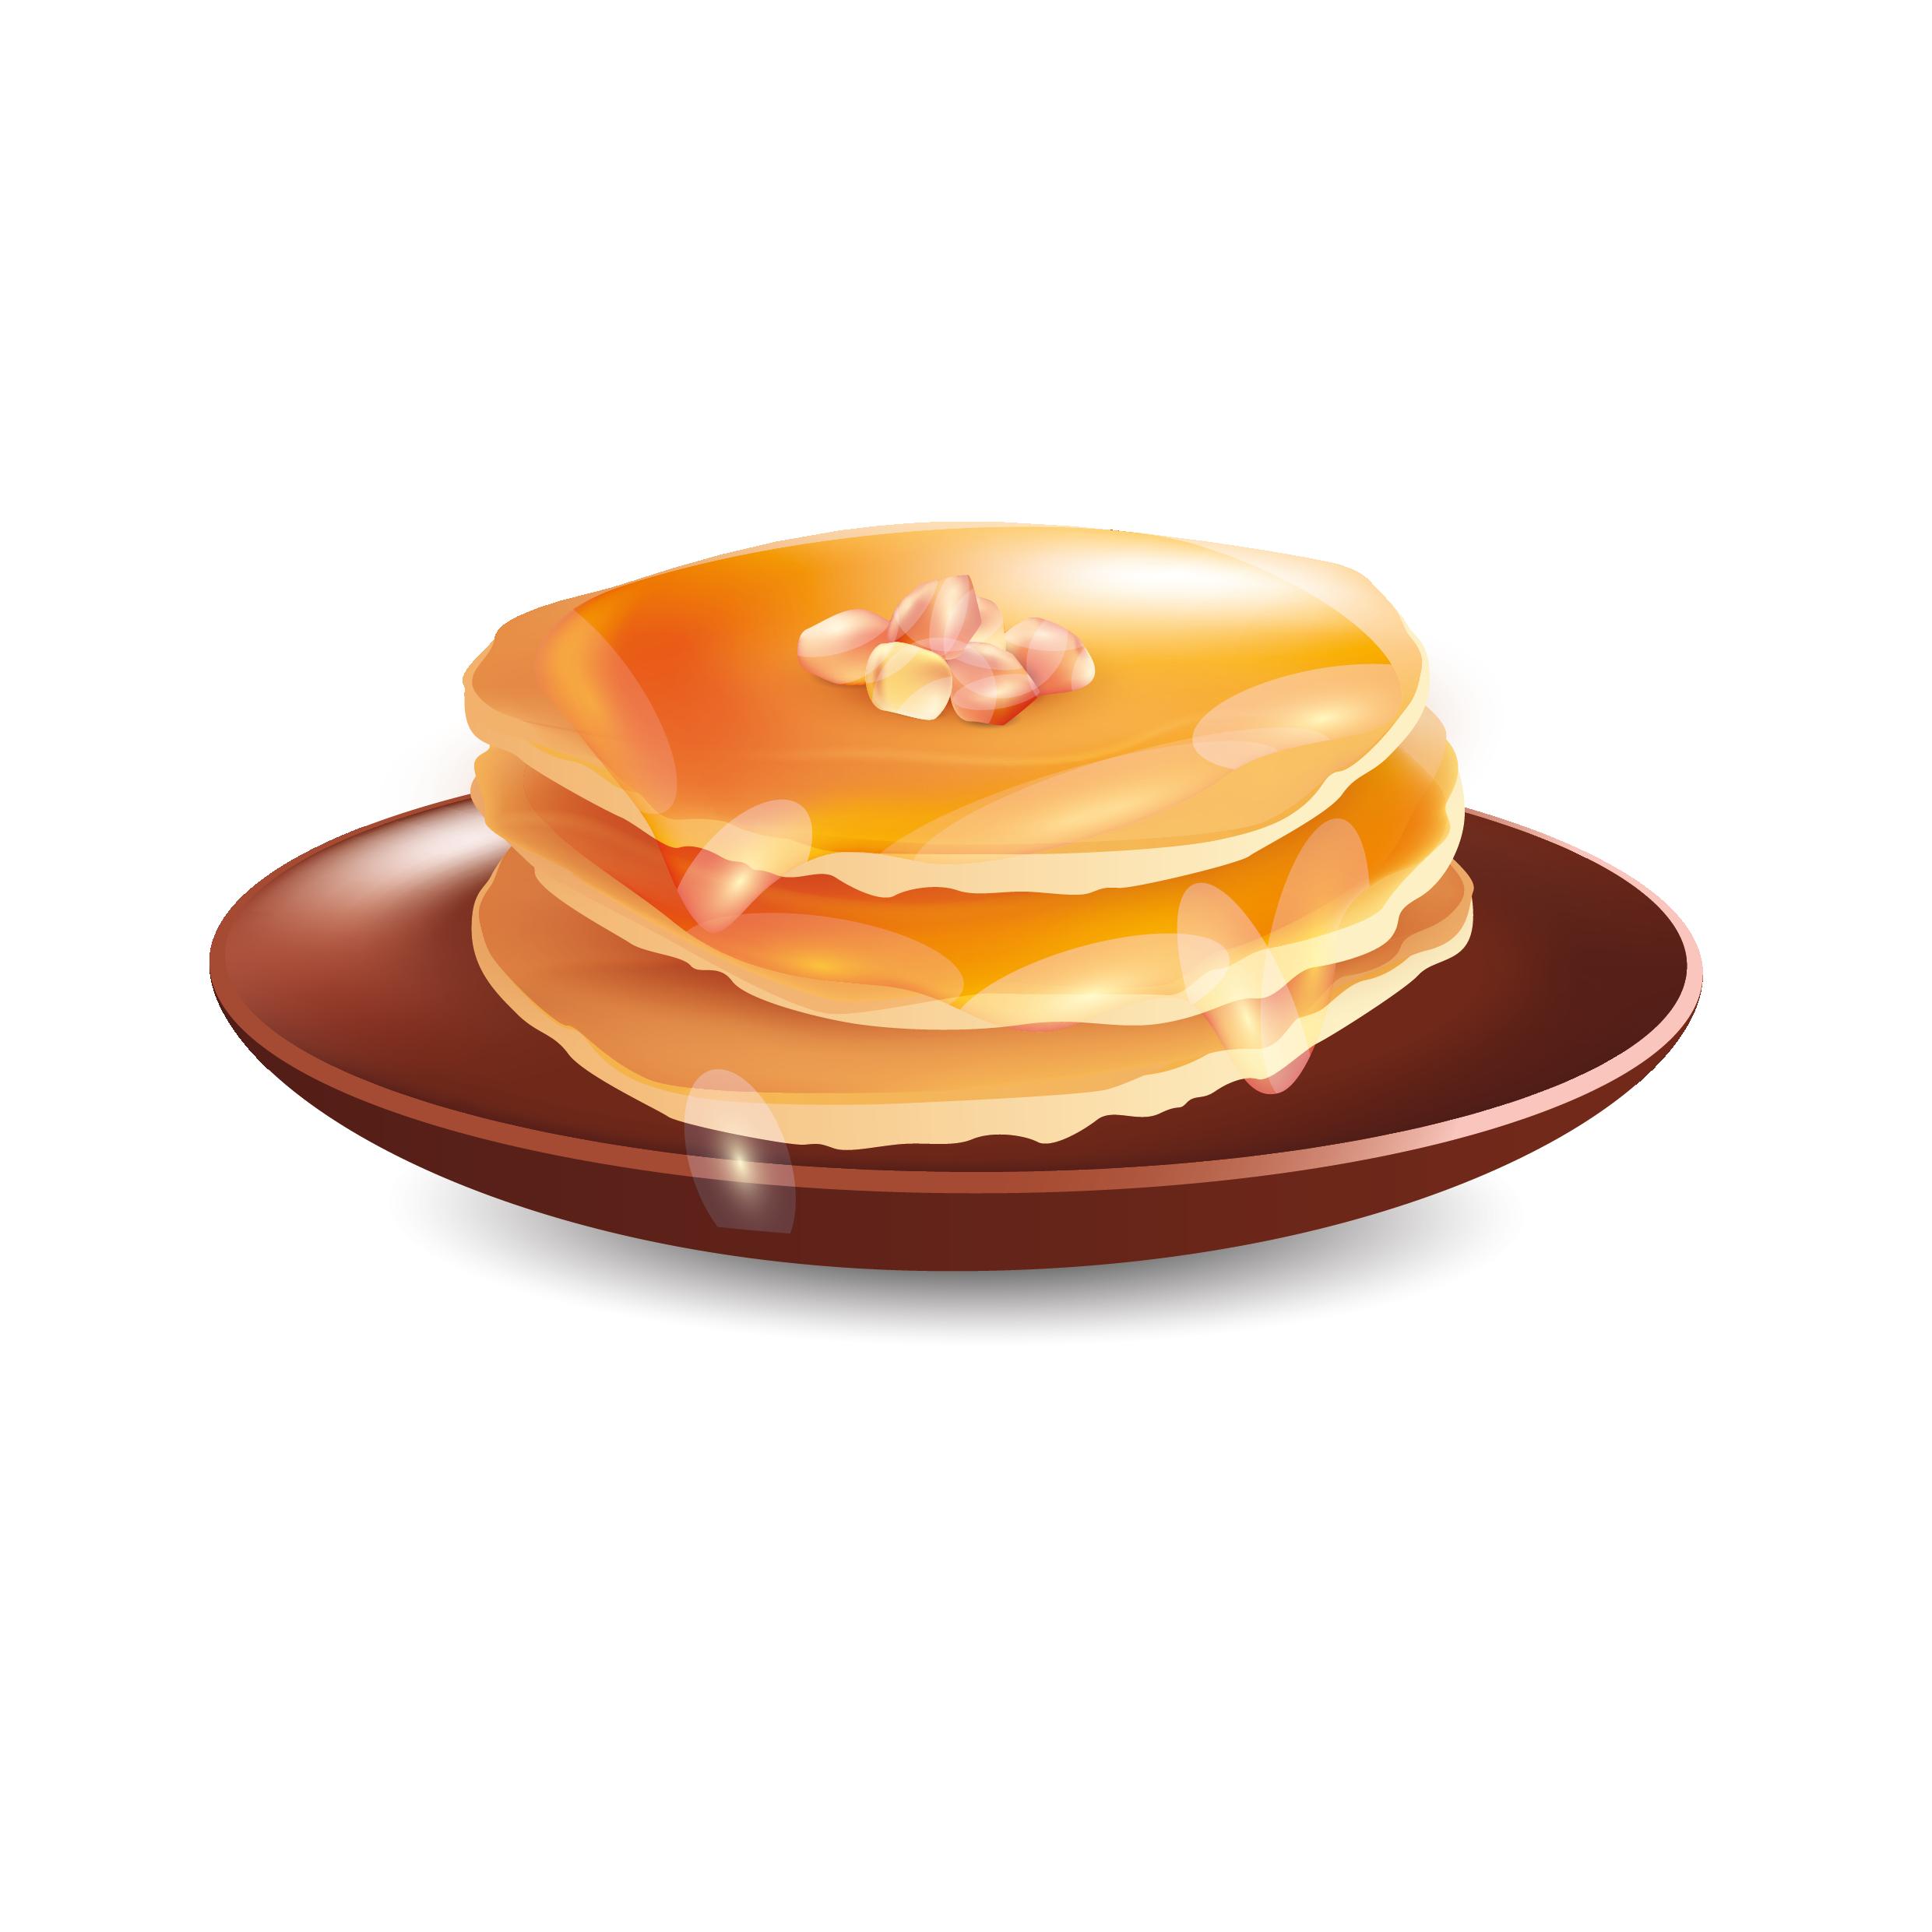 Pancake Miel/sirop érable